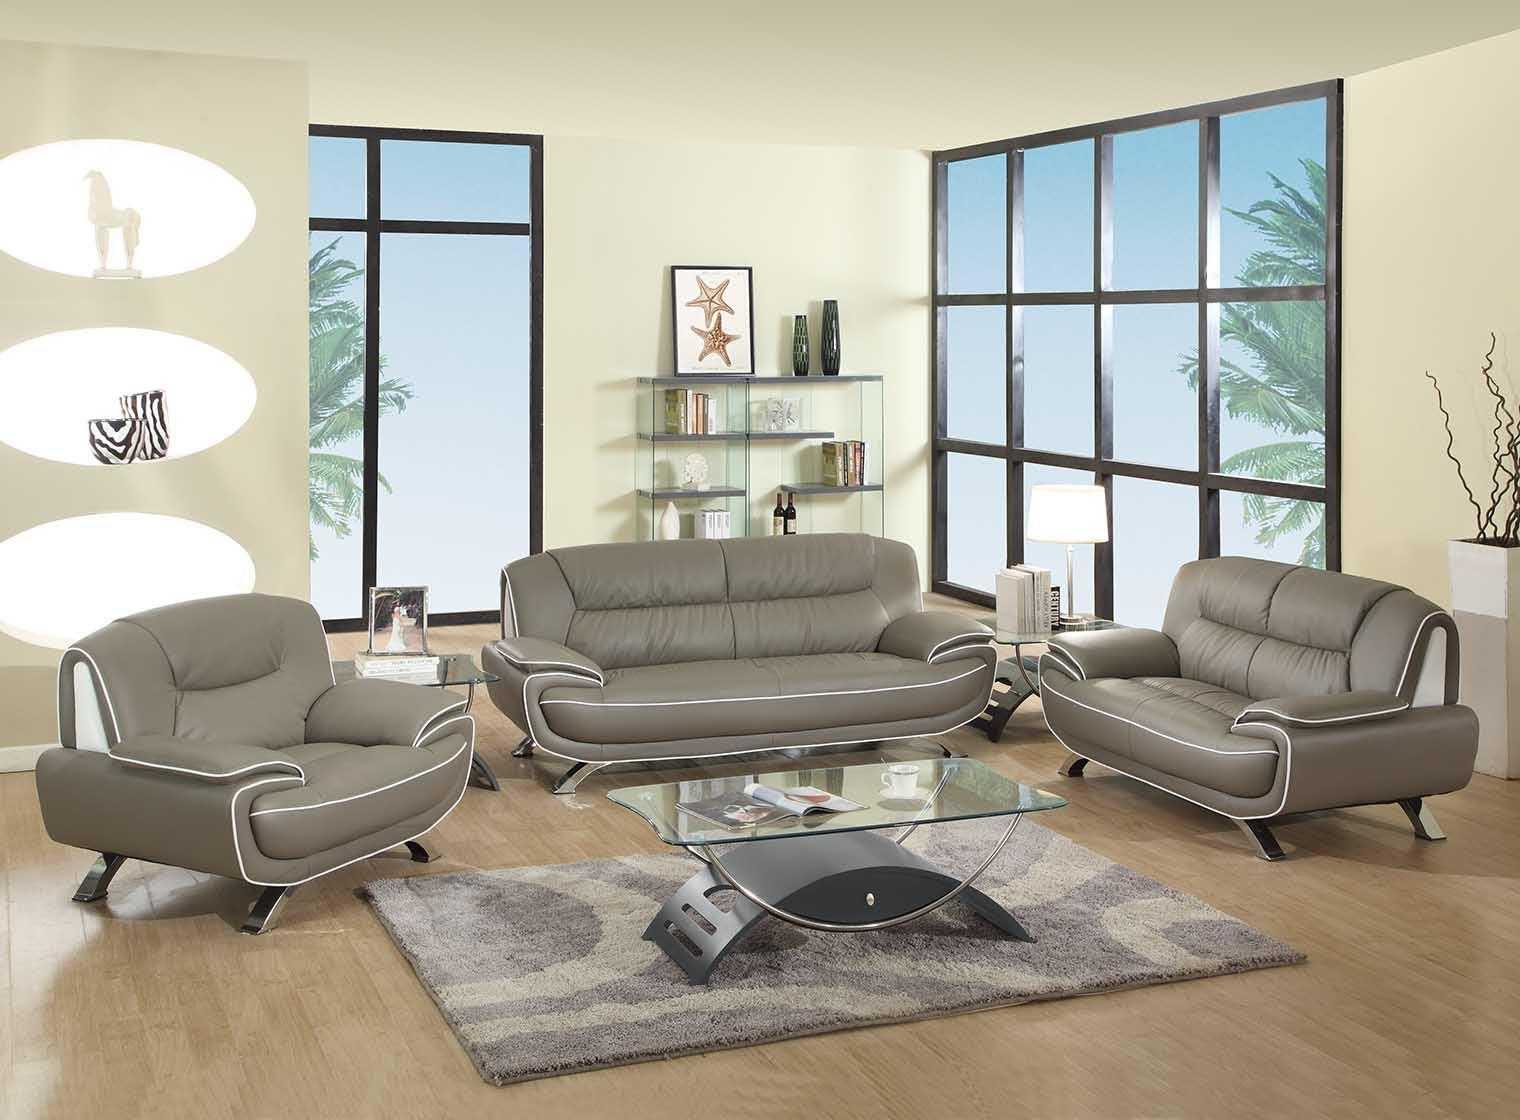 Amalfi Grey and White Leather Living Room | Las Vegas ...